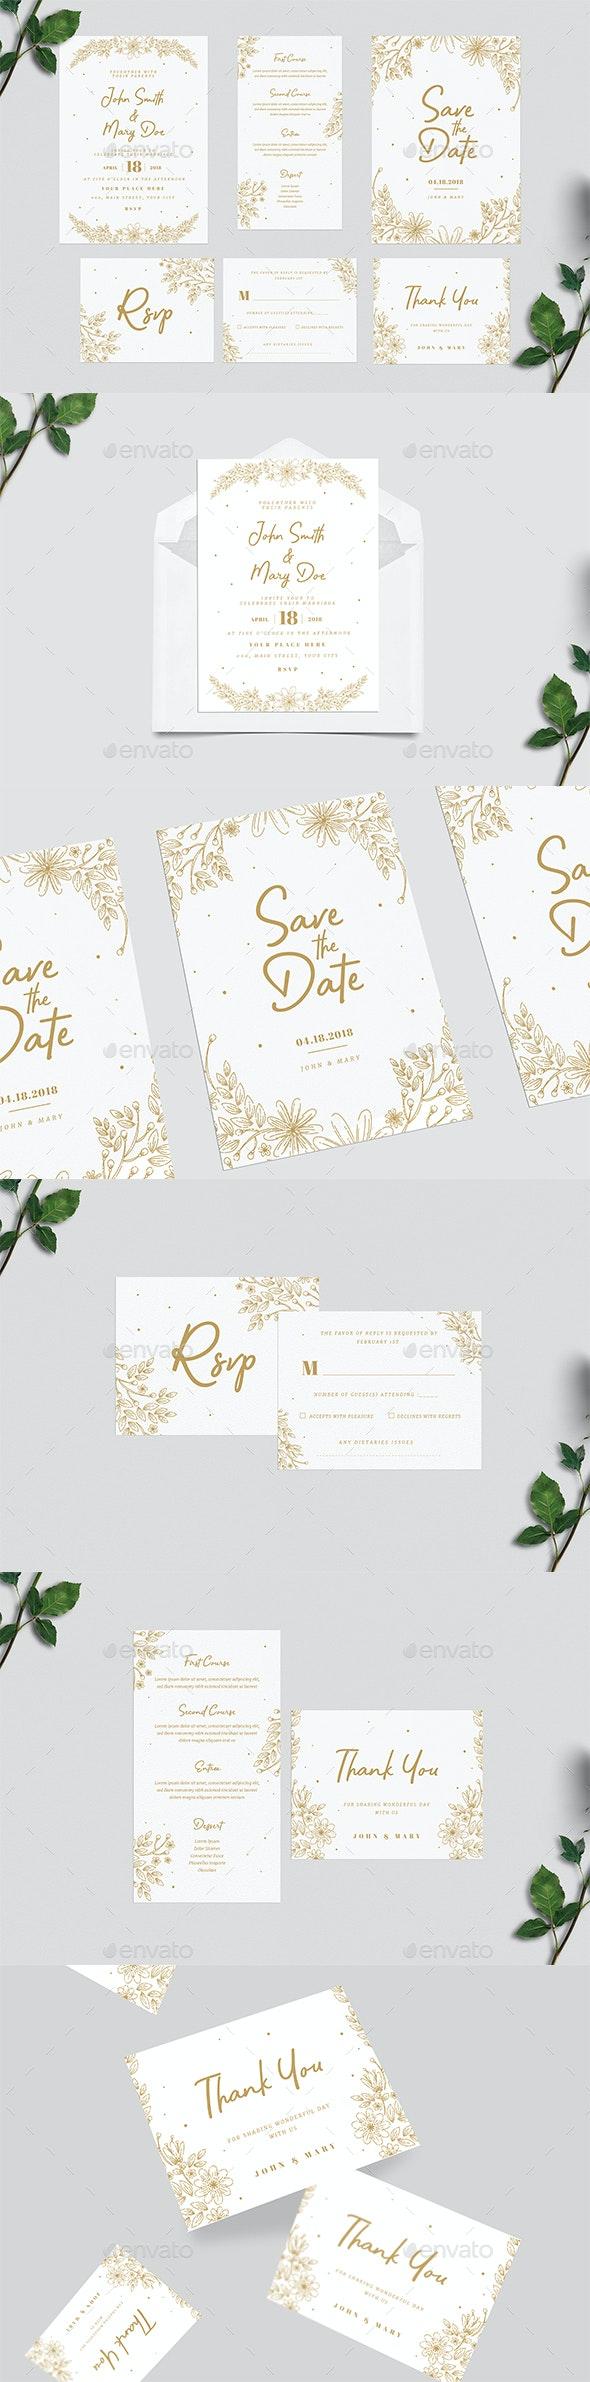 Gold Floral Wedding Invitation Suite - Weddings Cards & Invites